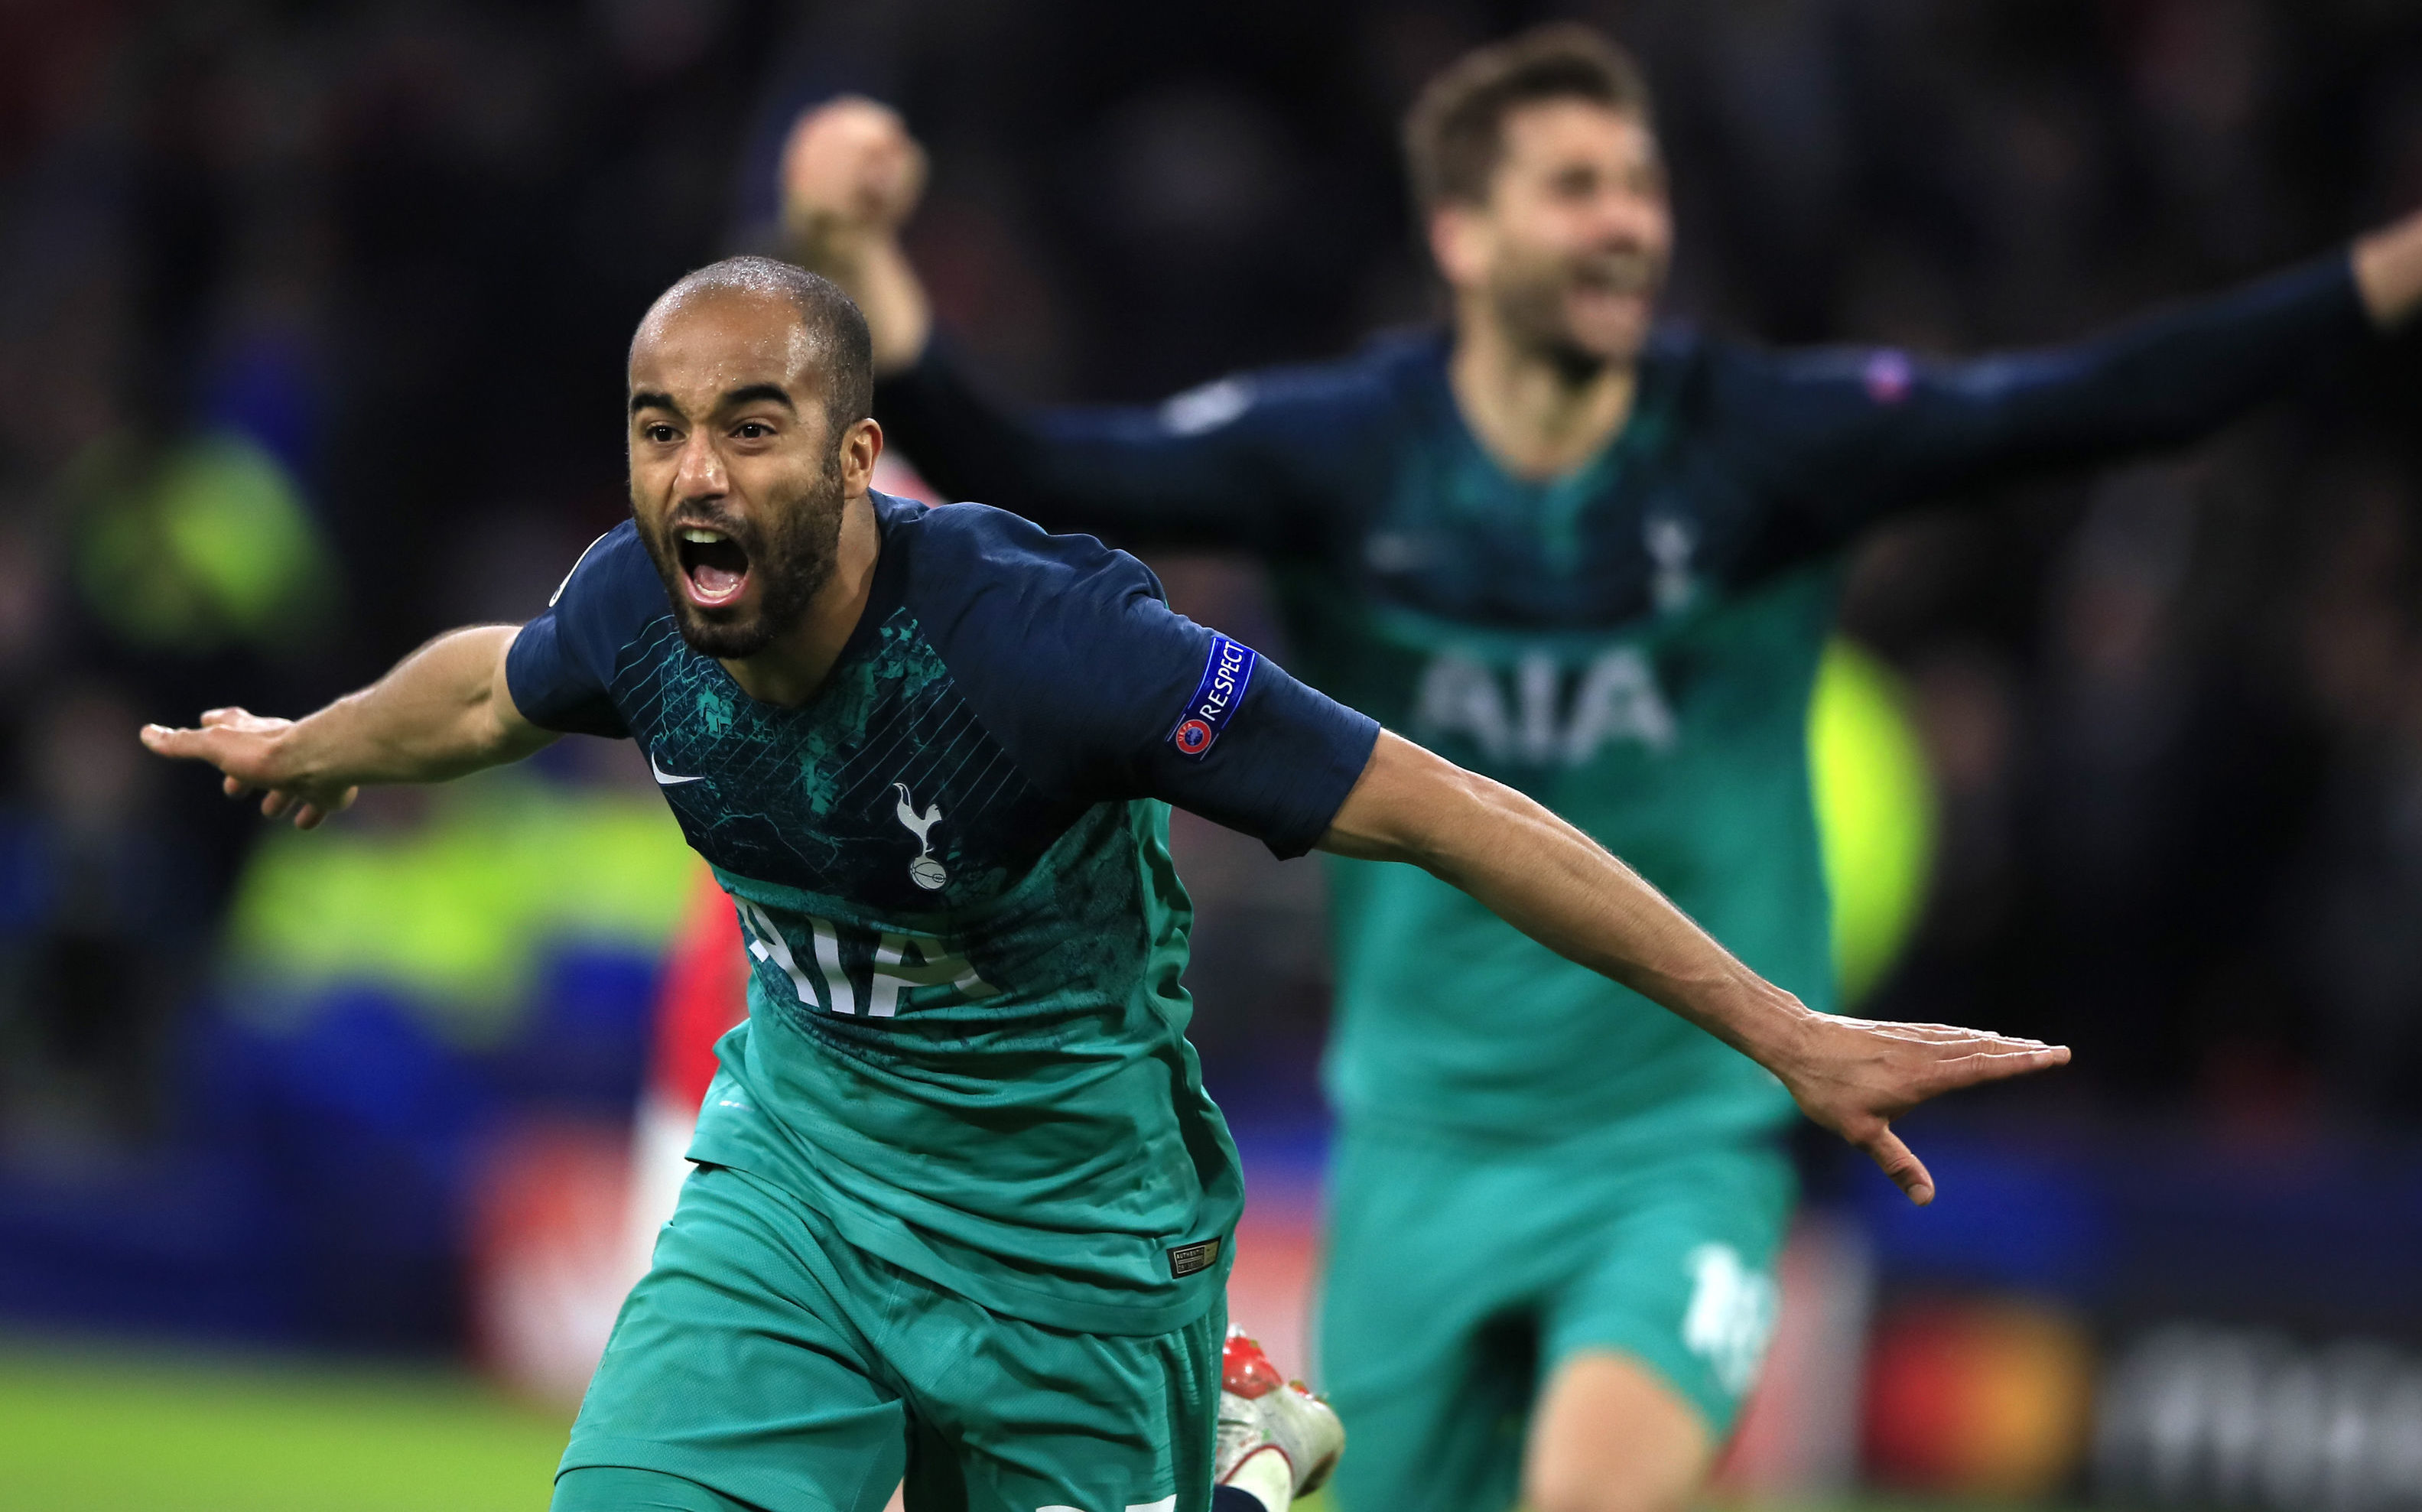 Tottenham's Lucas Moura celebrates after scoring his side's third goal